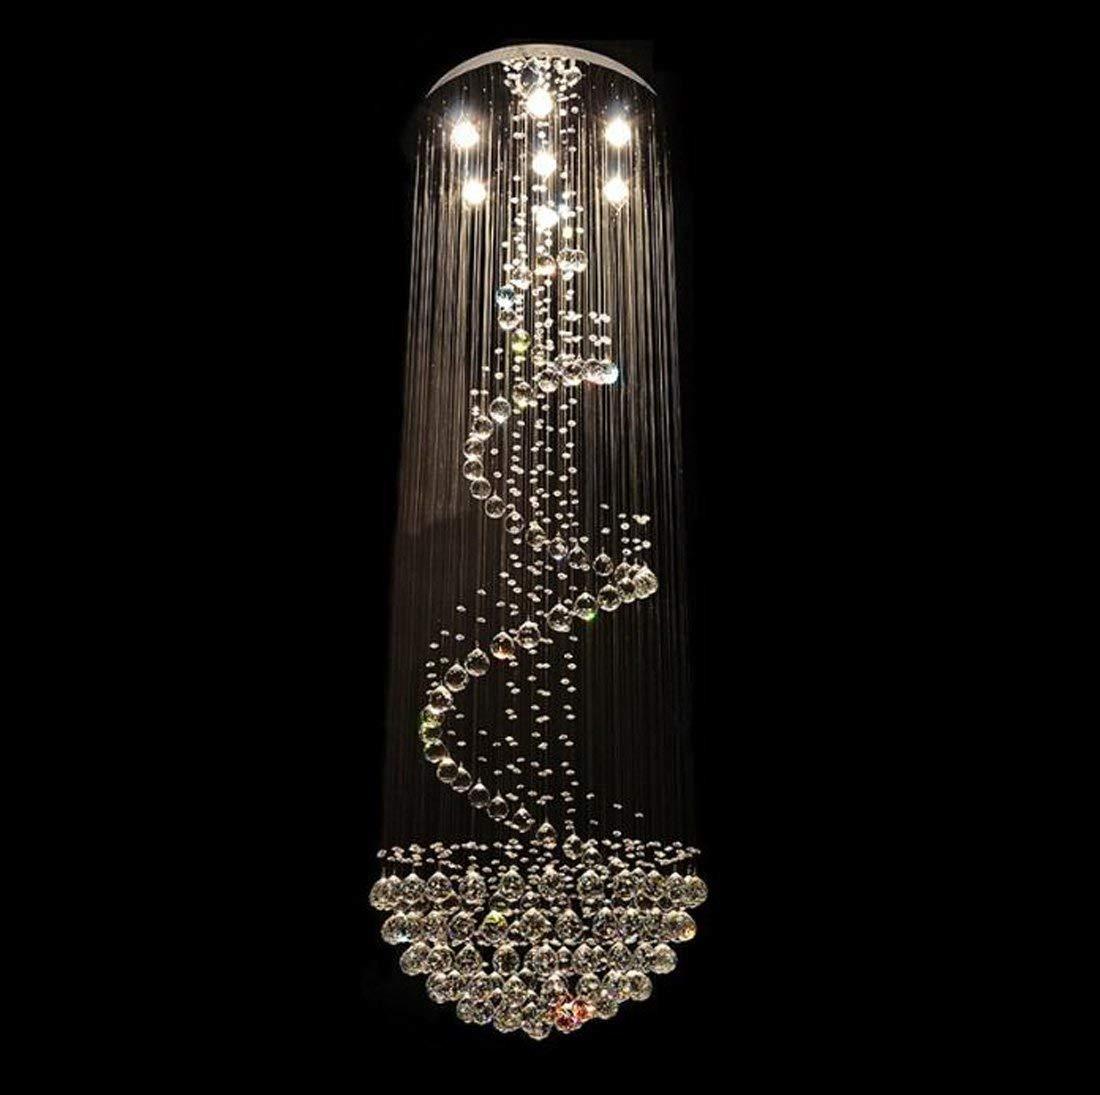 Led Crystal Lamp Round Villa Stair Lamp Hotel Front Desk Lamp Double Floor Lamp Creative Living Room Lamp 110V-220V (Color : 5W LED Warm White Bulb)